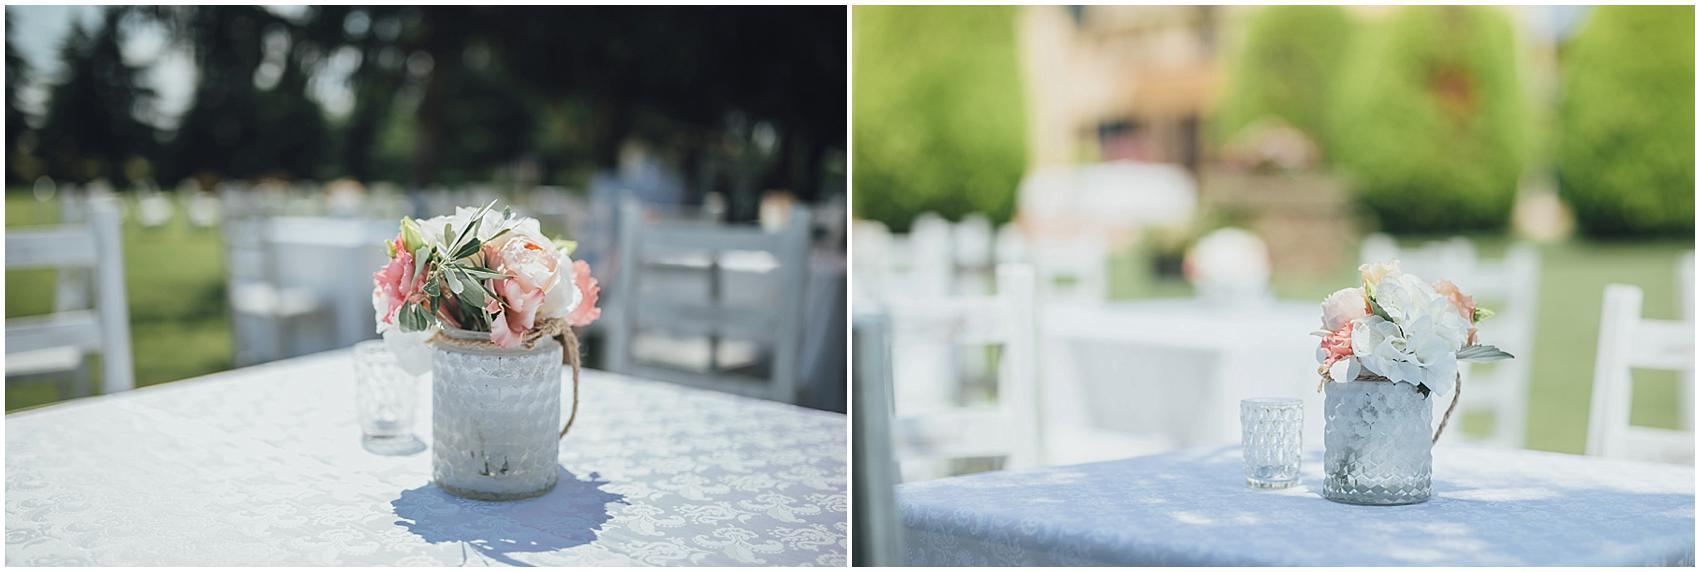 destination-wedding-phtotographer-italy-lake-garda_0529